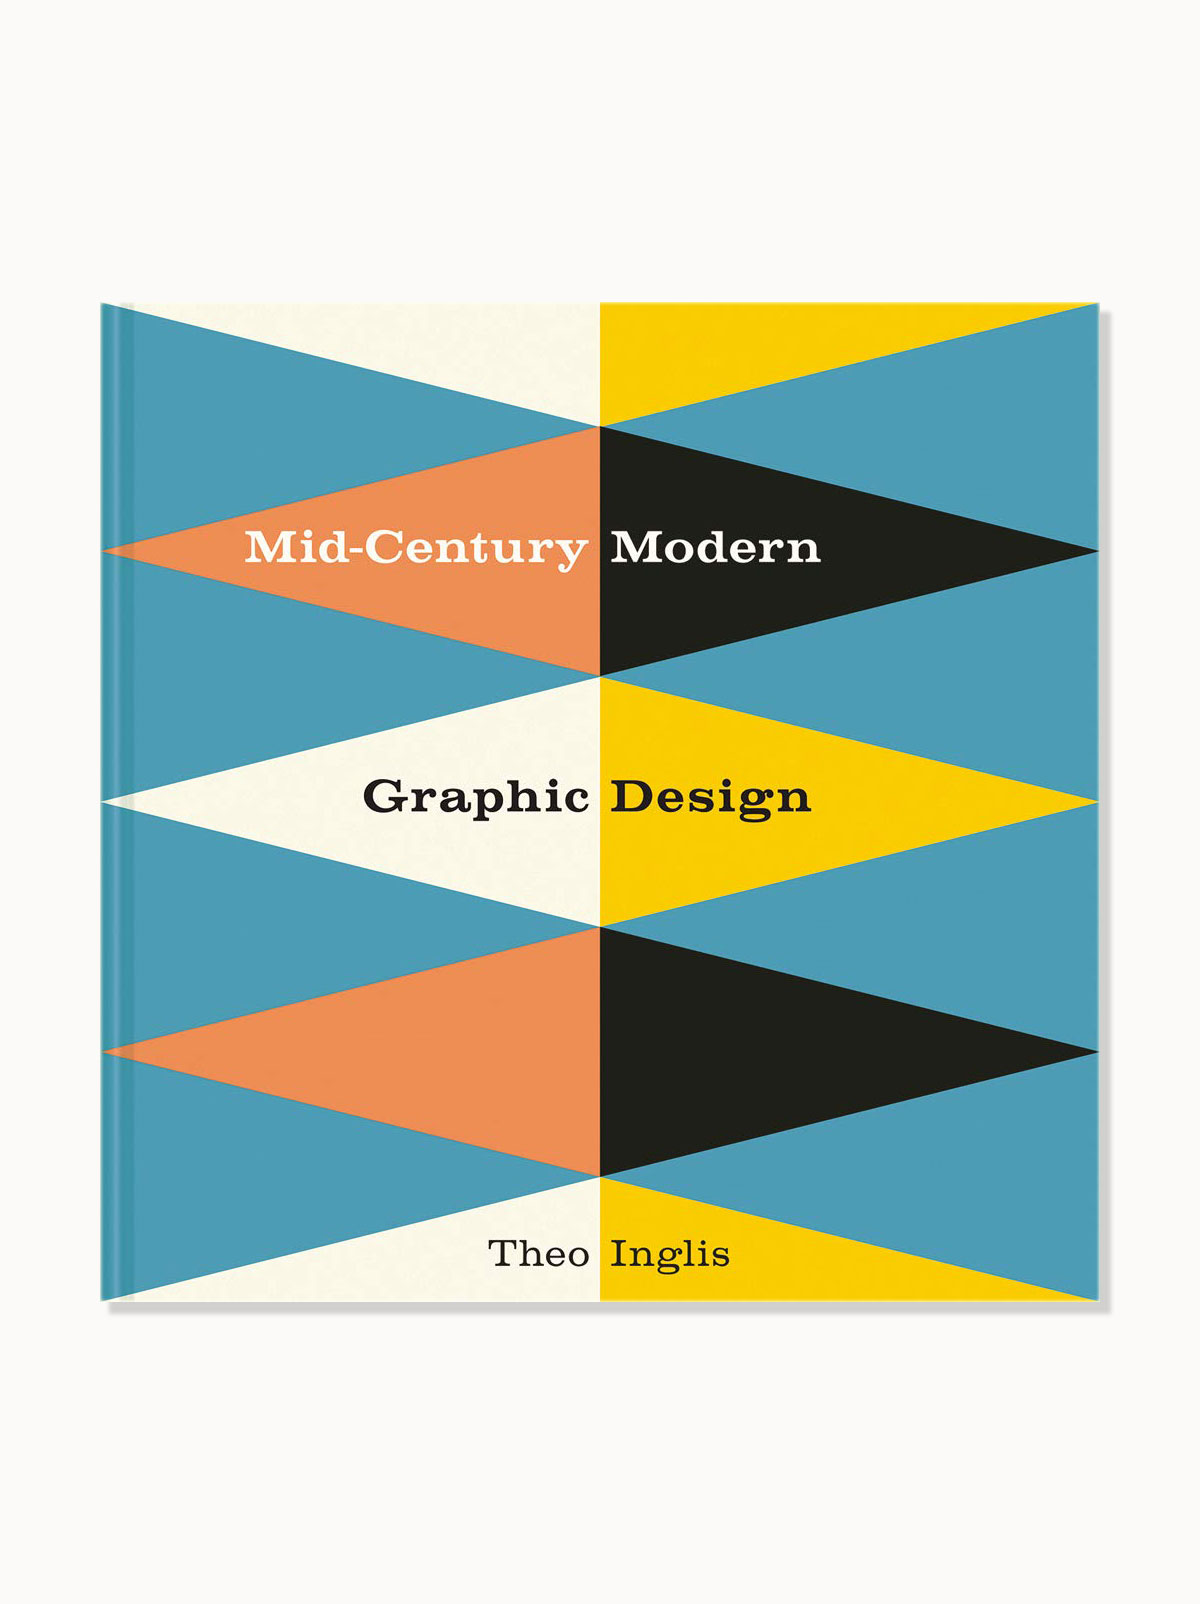 Design: Theo Inglis